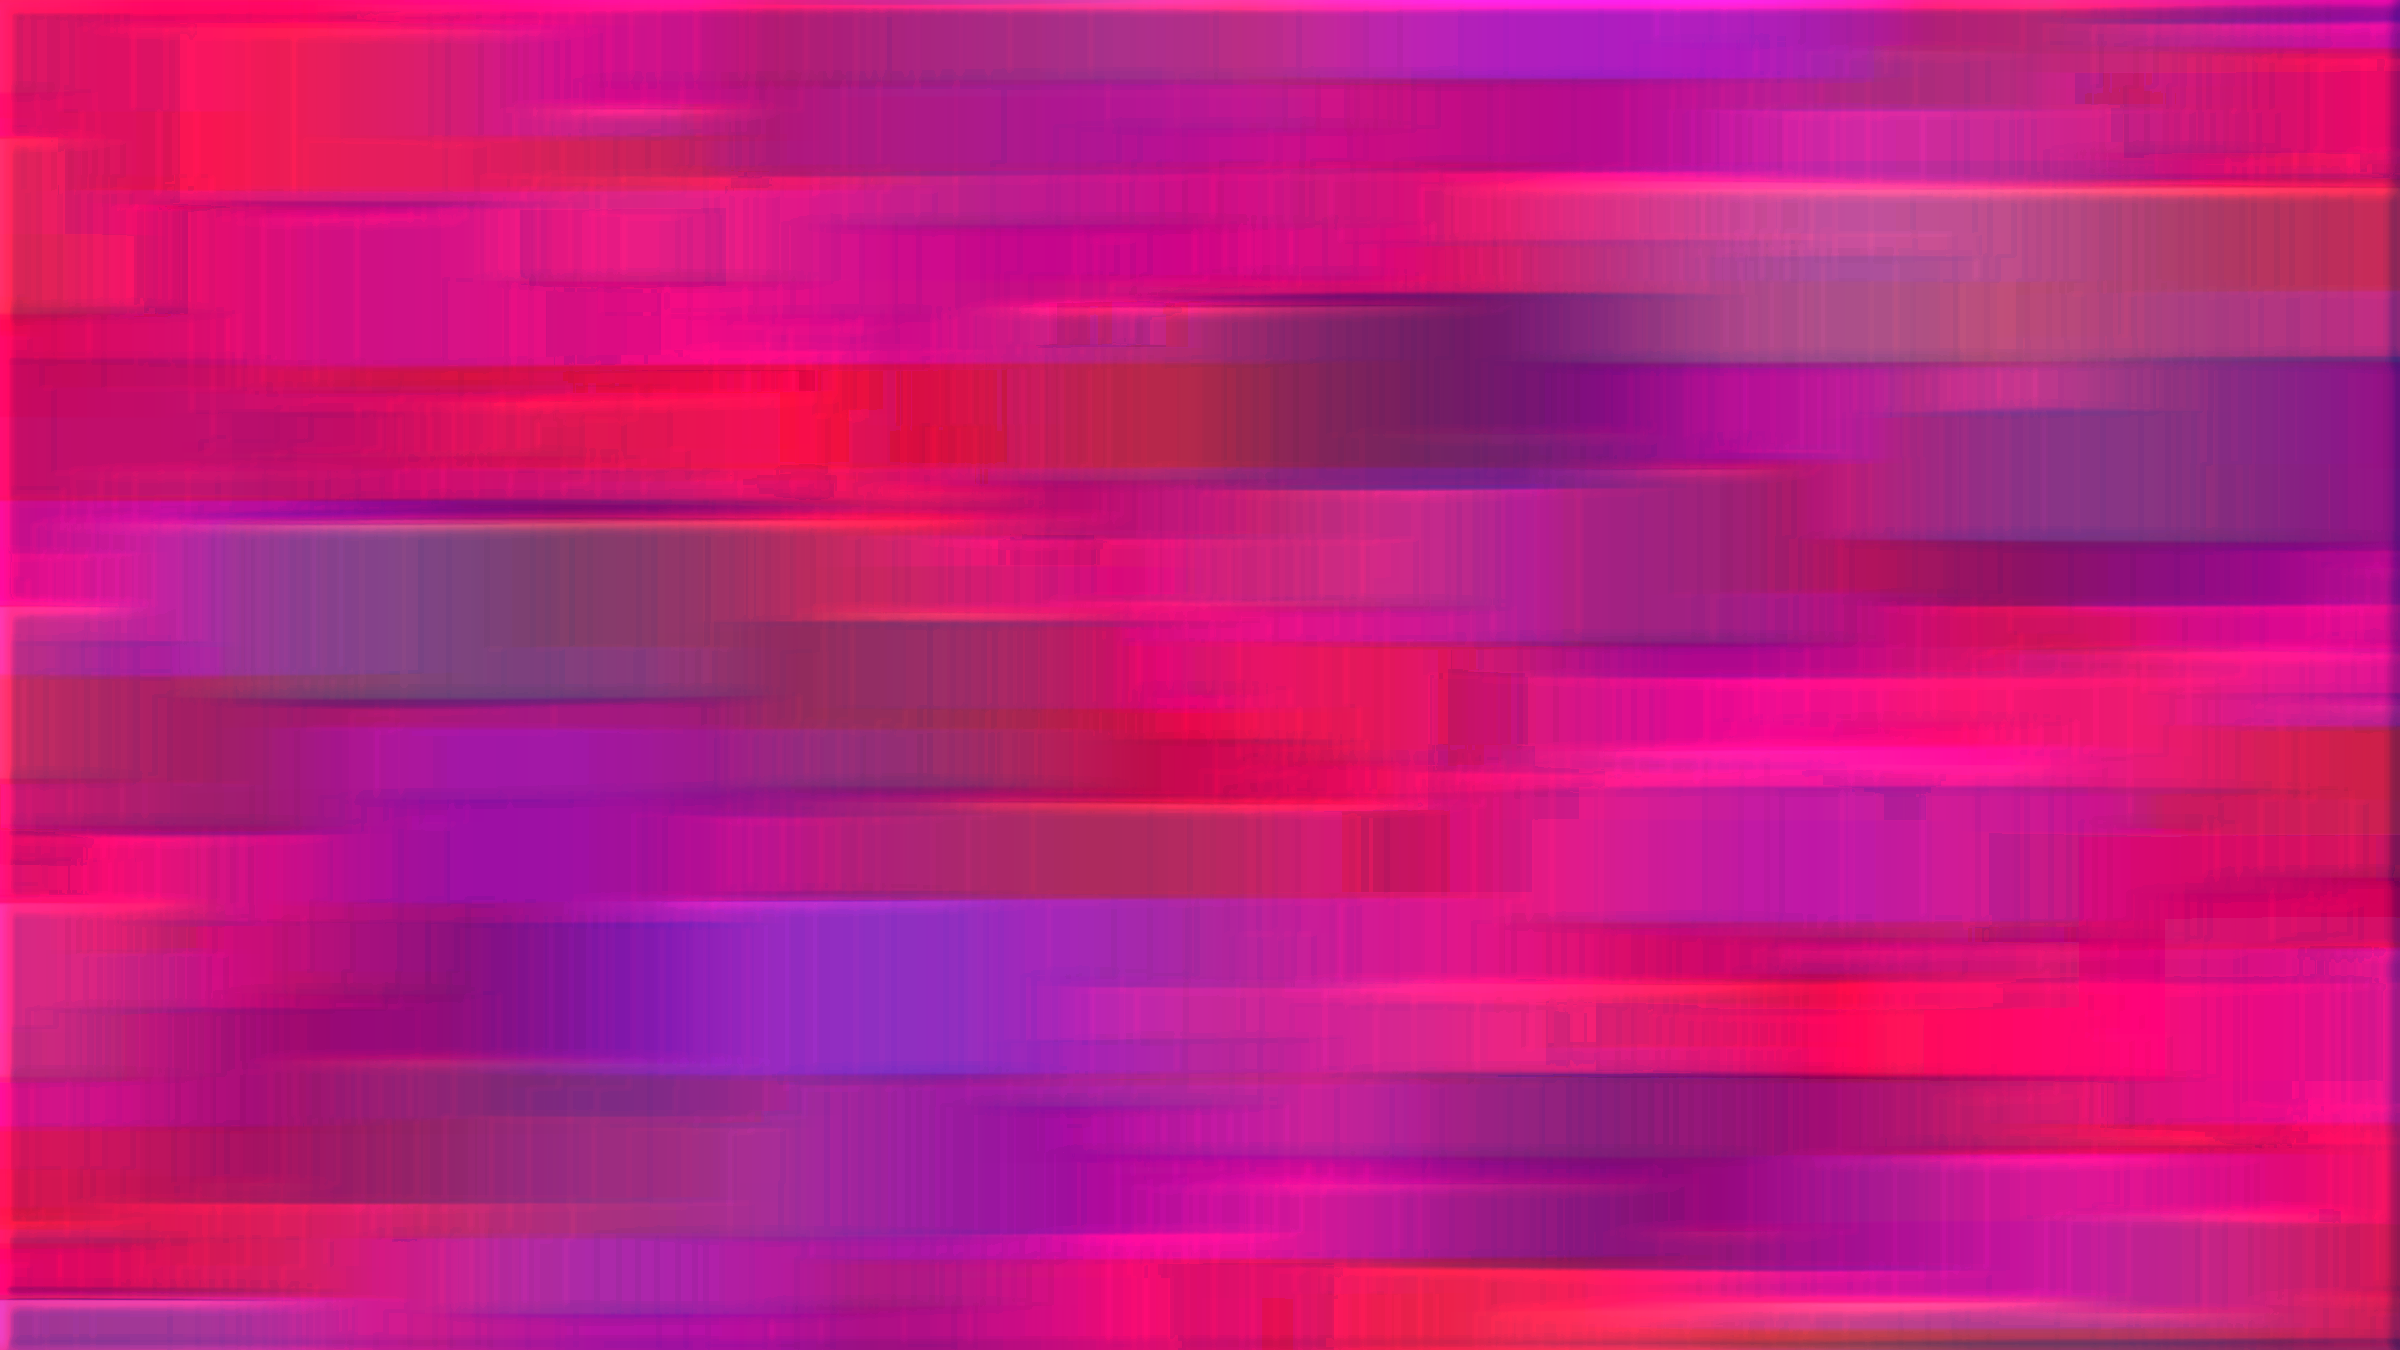 purple colour hd wallpaper download